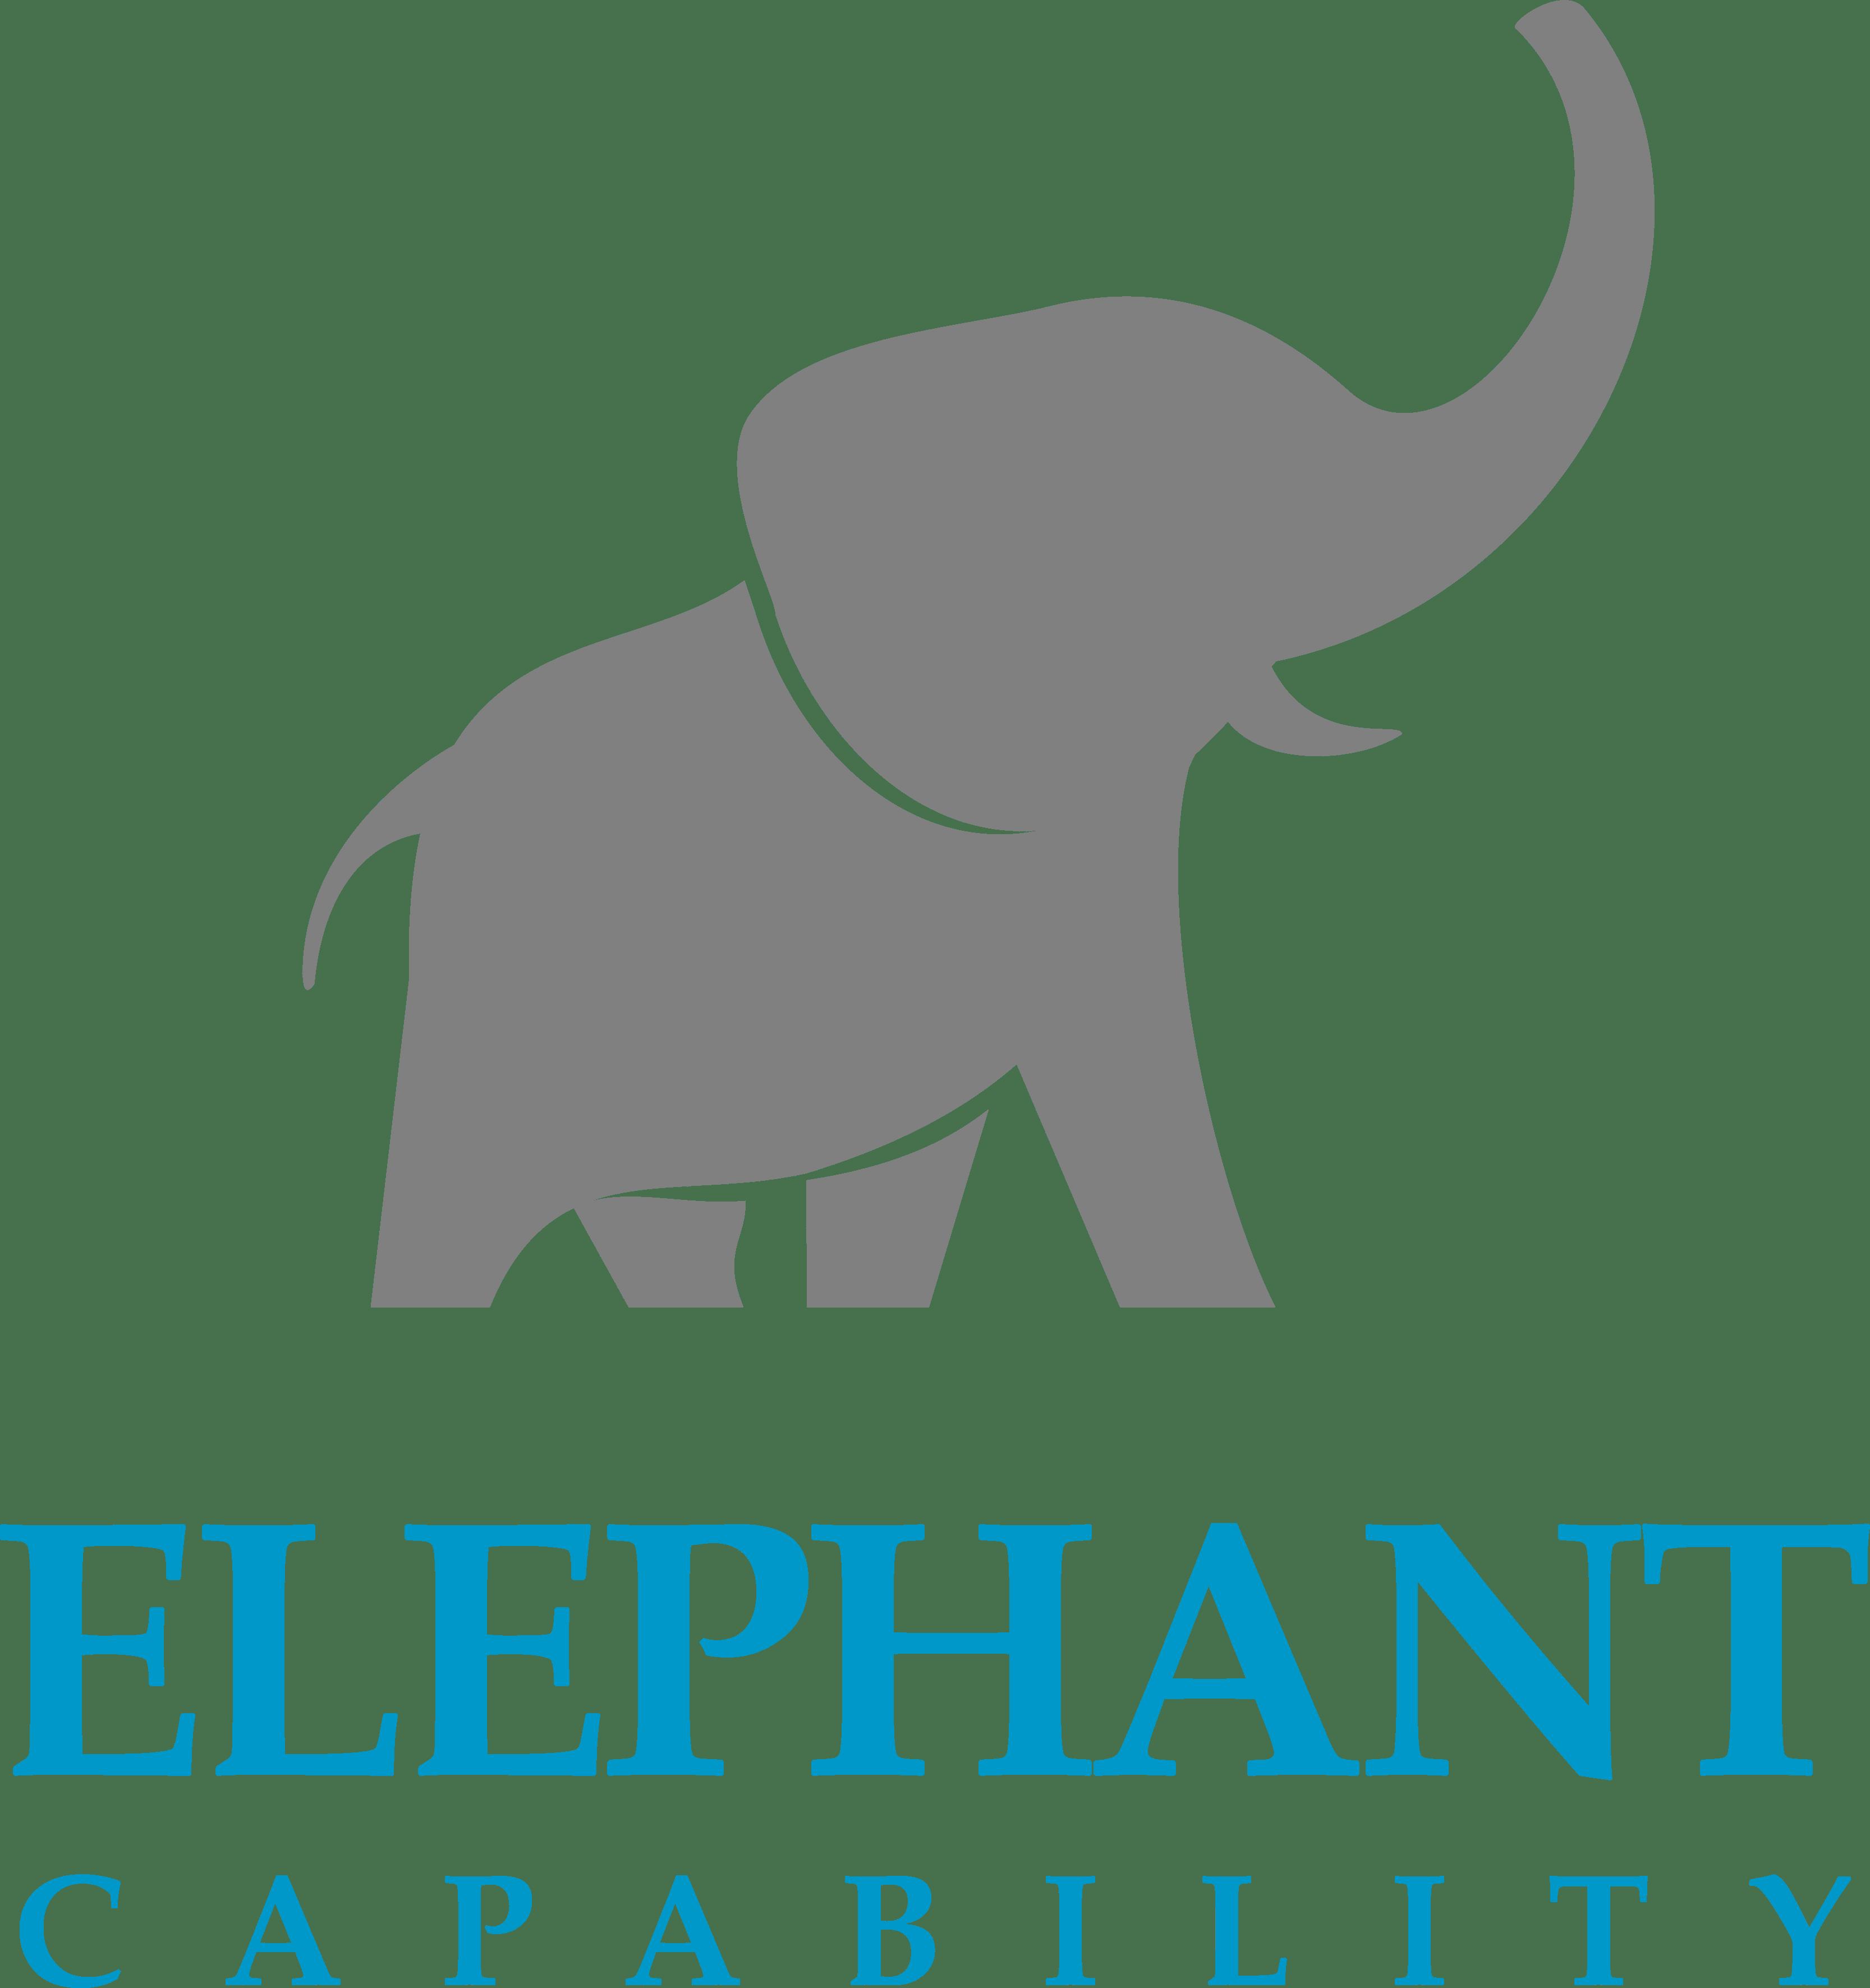 The elephant story. Psychology clipart capability